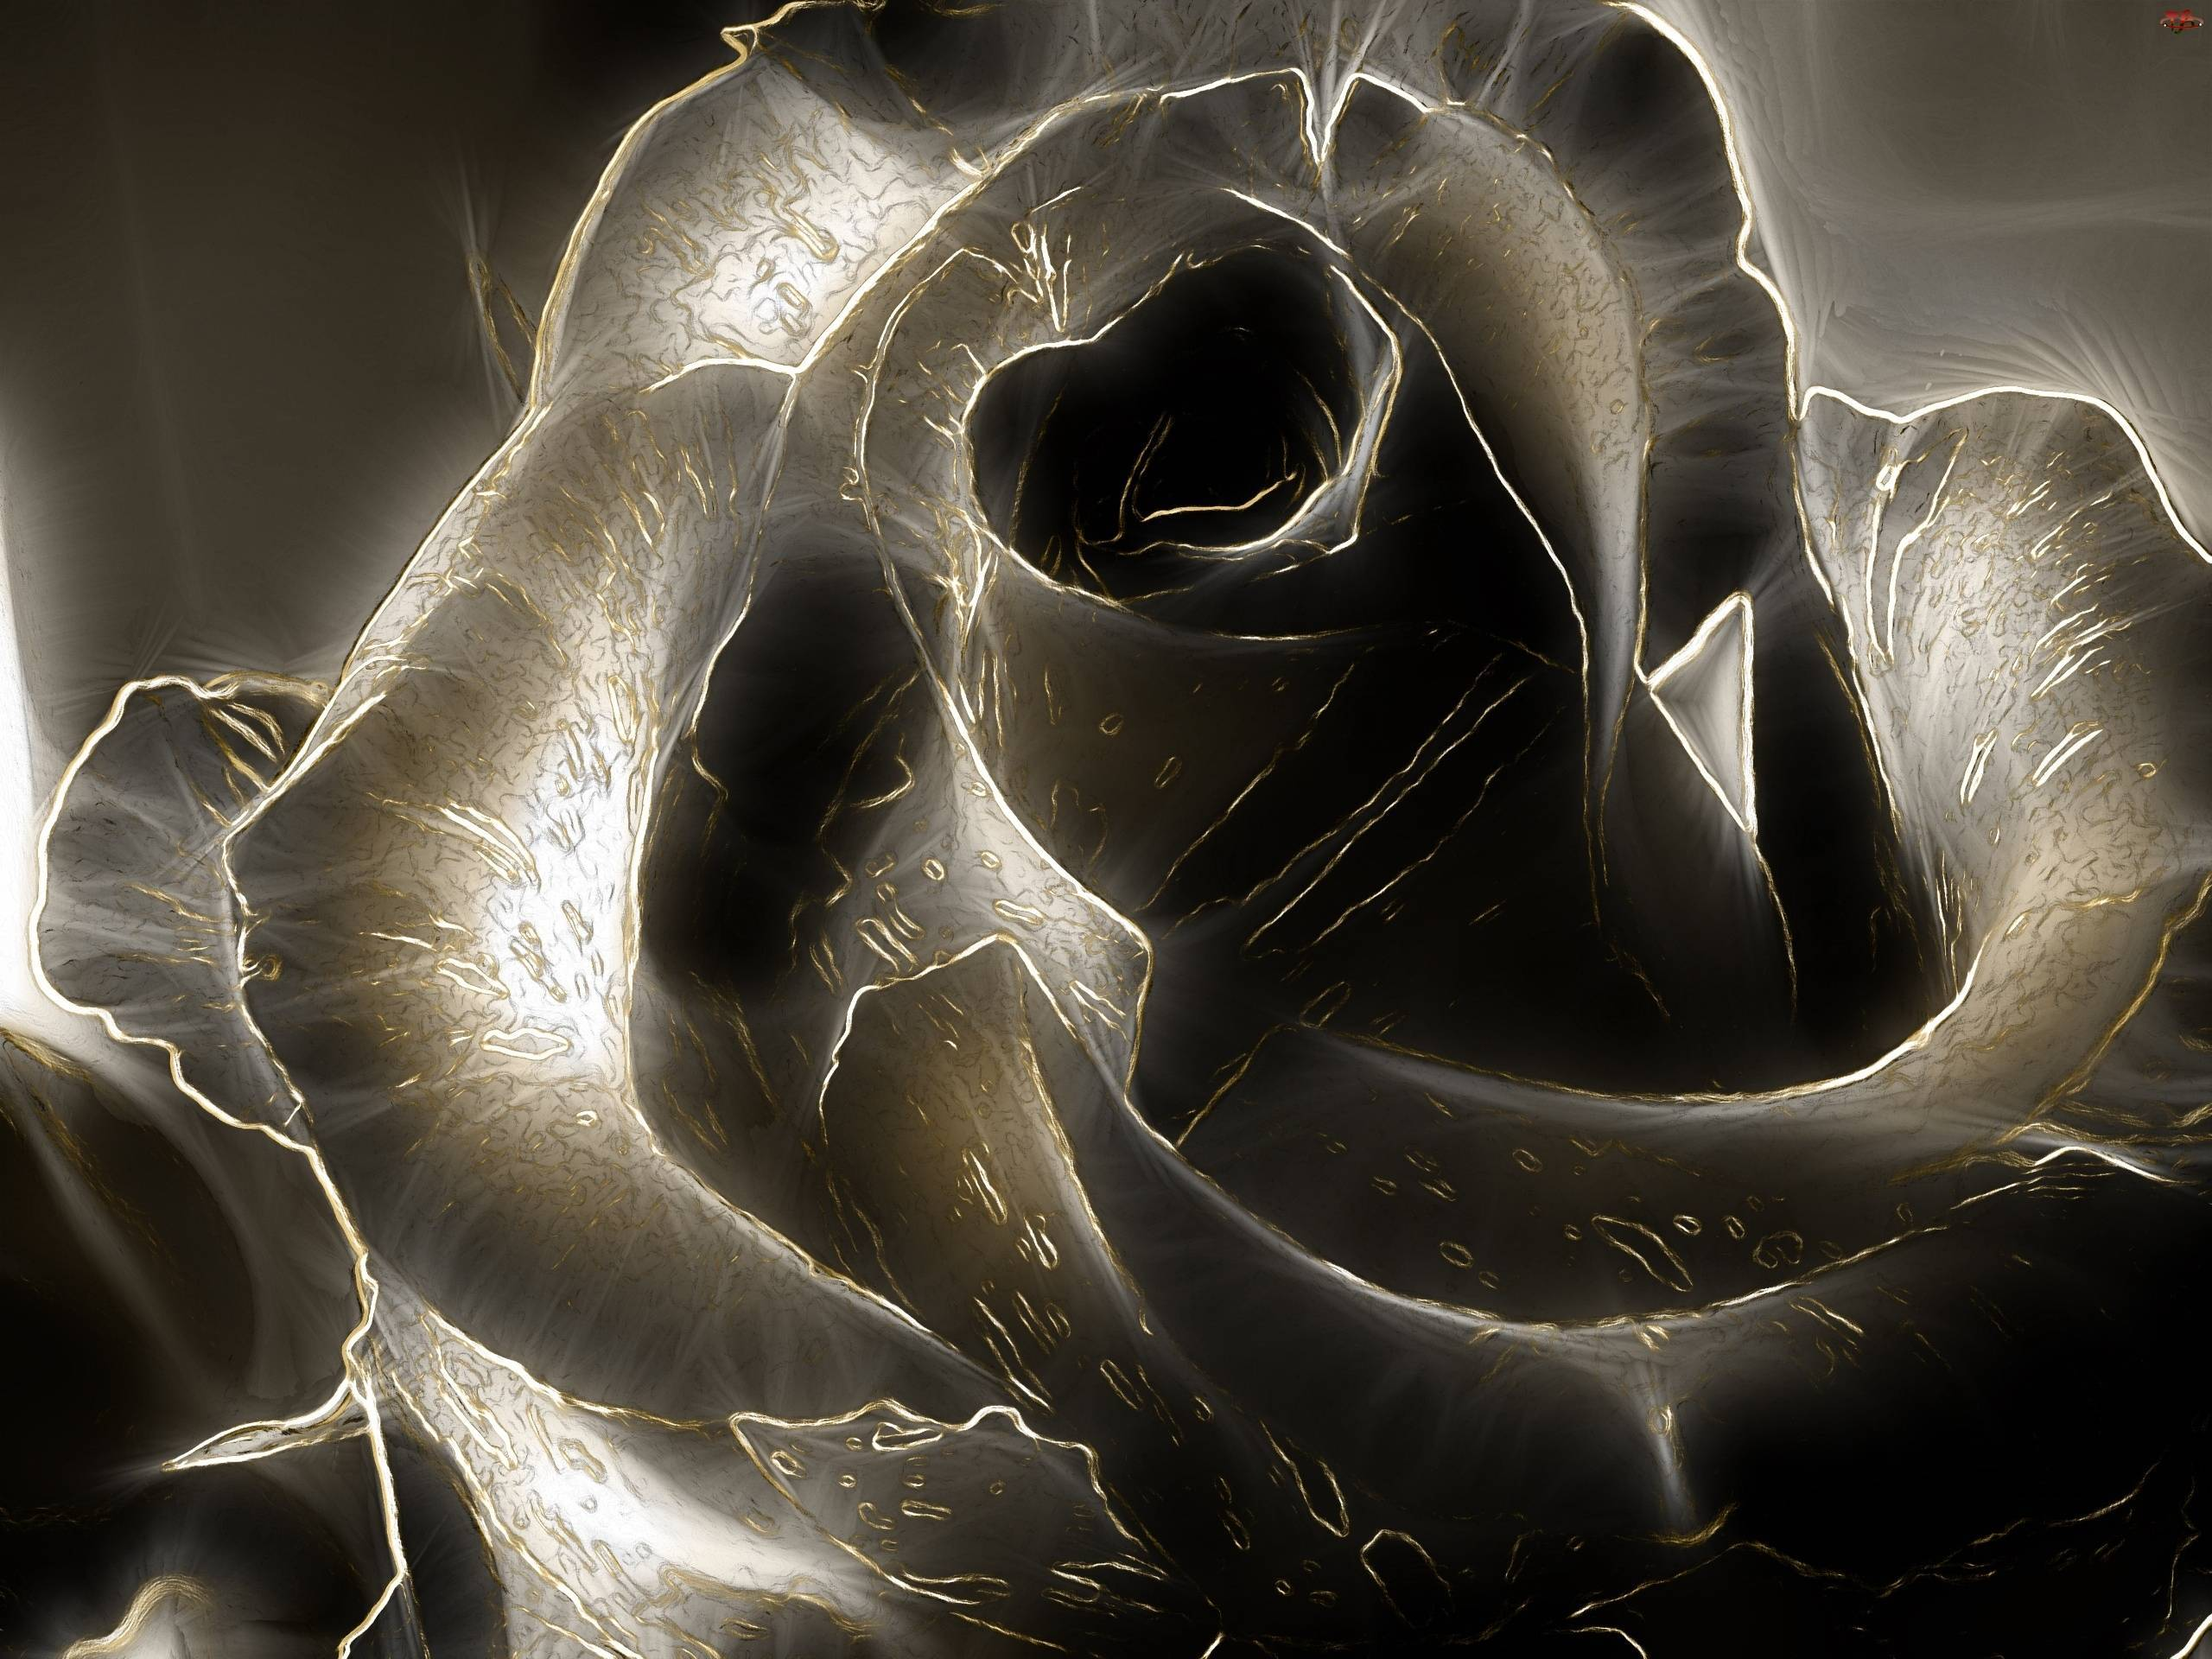 Black Rose Hd Desktop